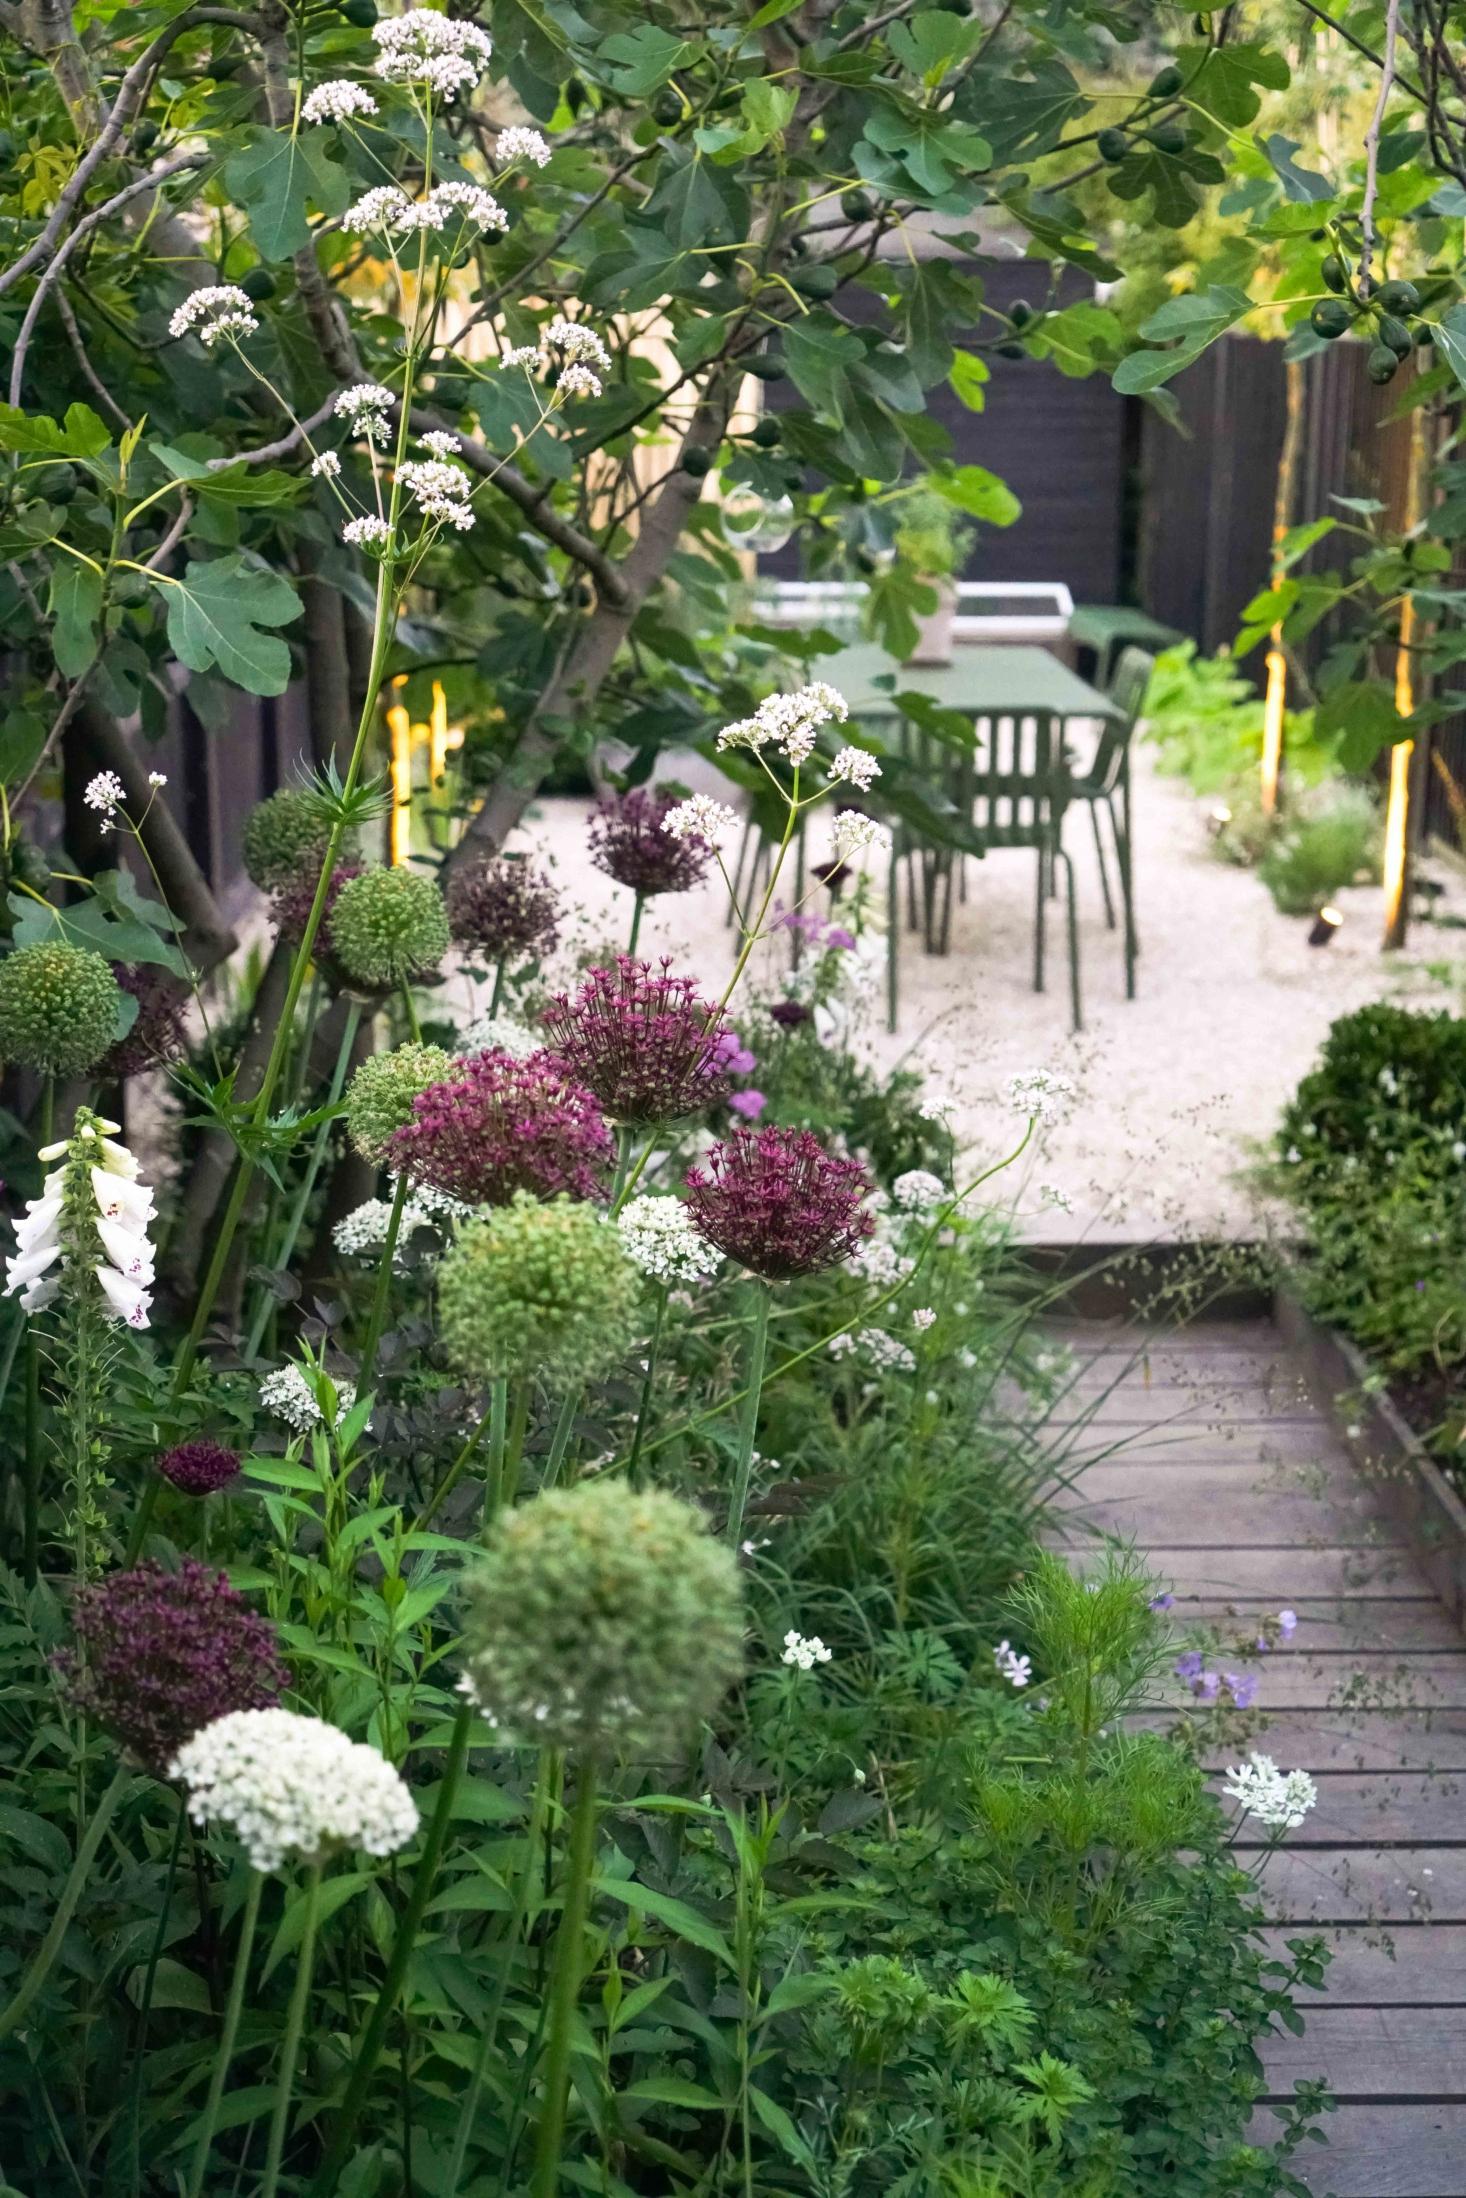 Before After A Seaside English Garden By Farlam Chandler Gardenista Smallgarden Seaside Garden English Garden Design Small Garden Design